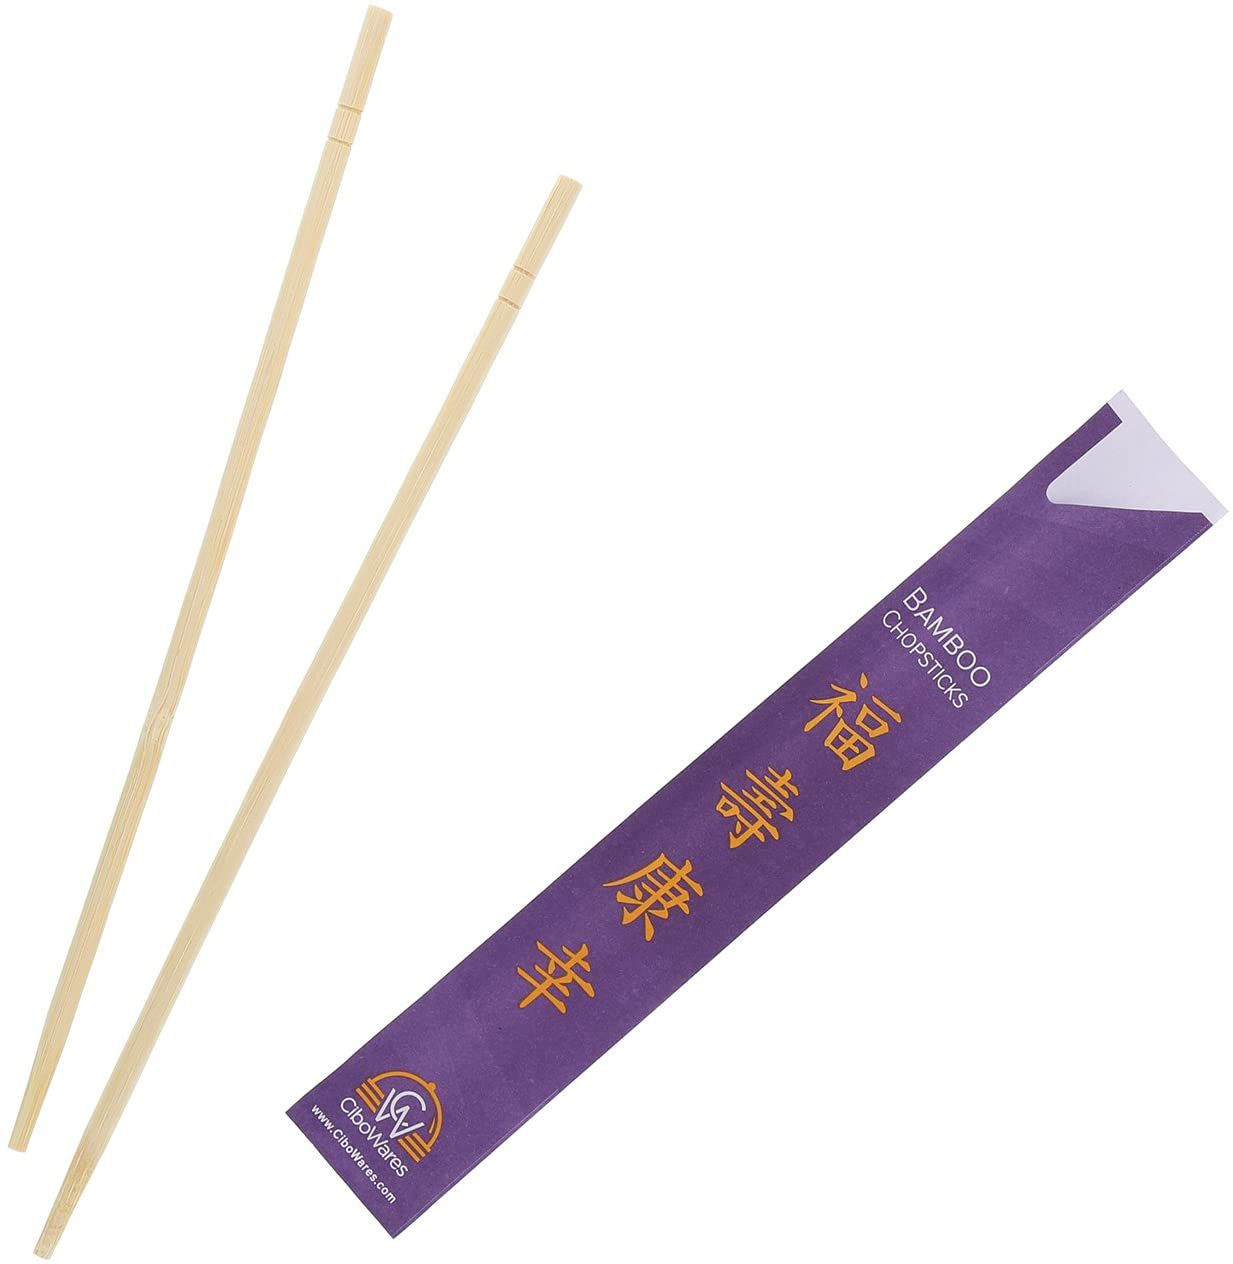 CiboWares Disposable Bamboo Chopsticks